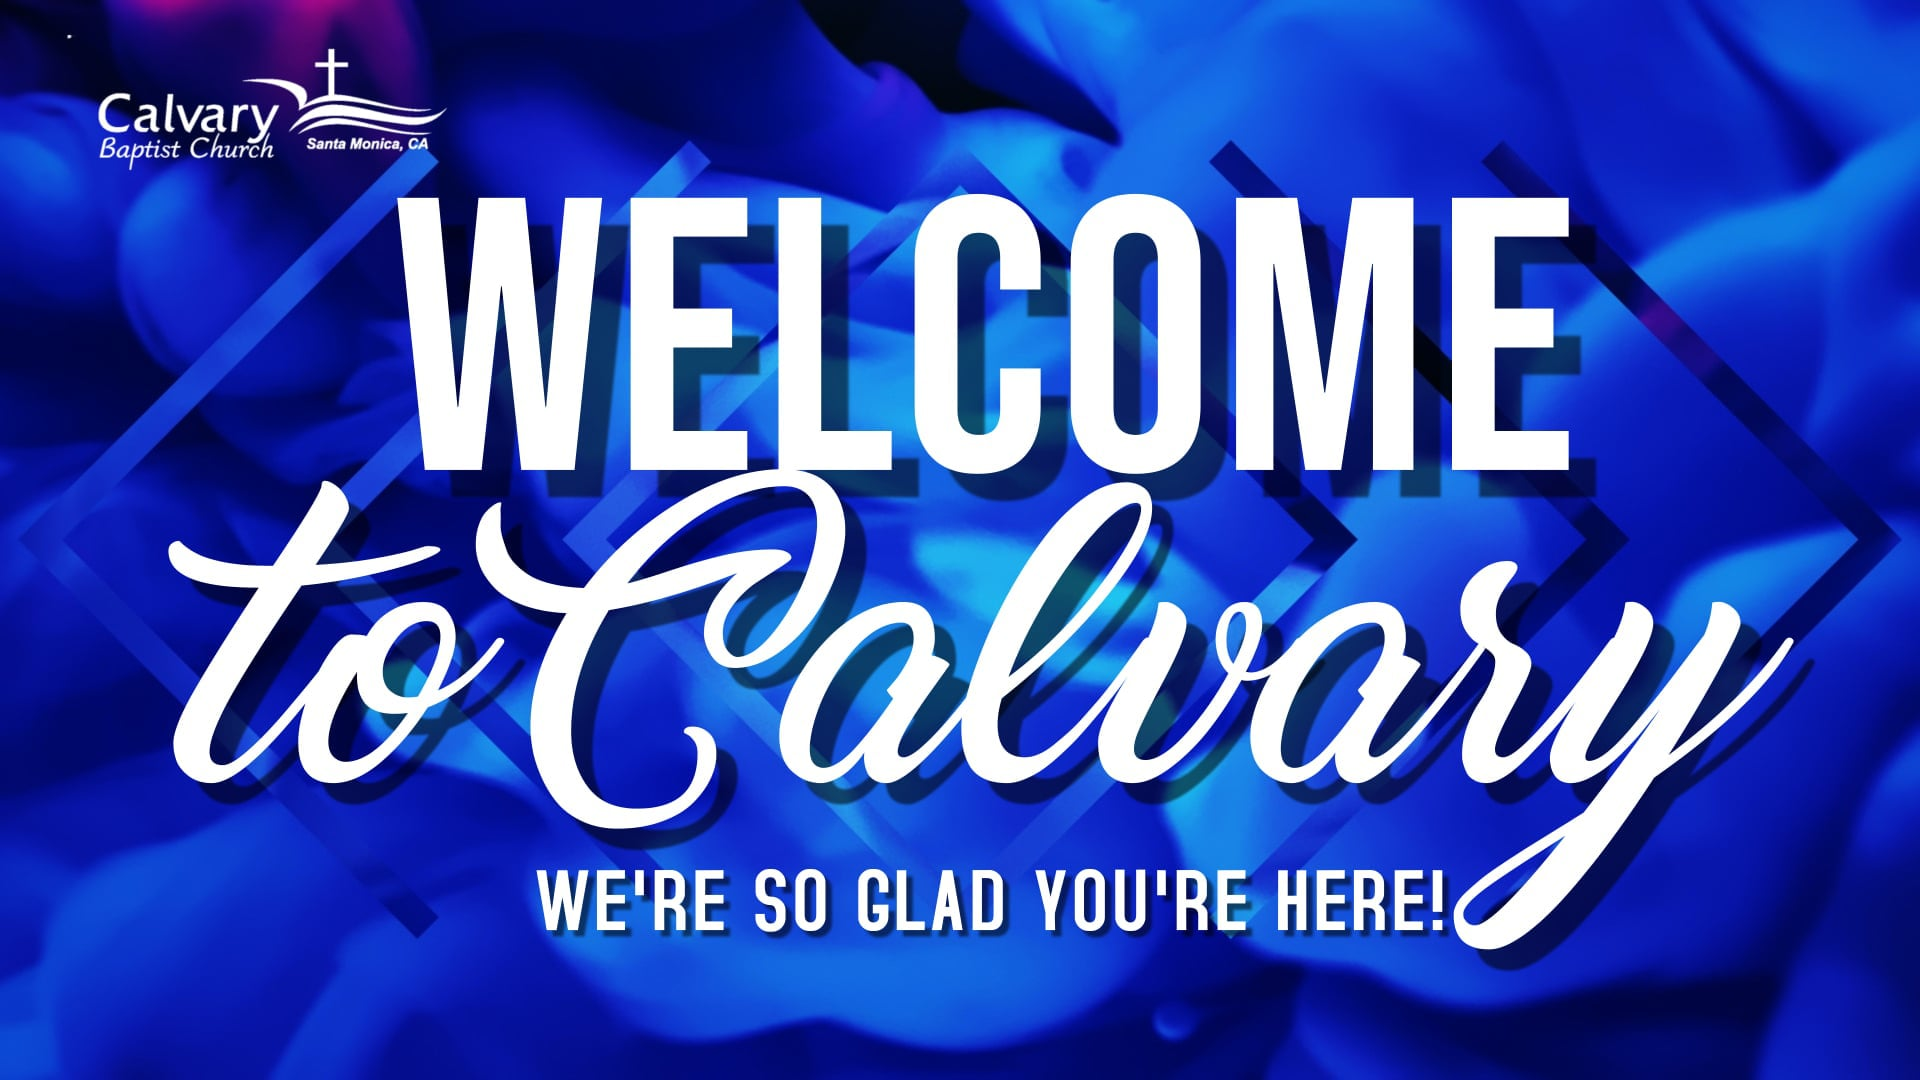 08.08.21 Calvary Baptist Church 10:30 am Worship Service